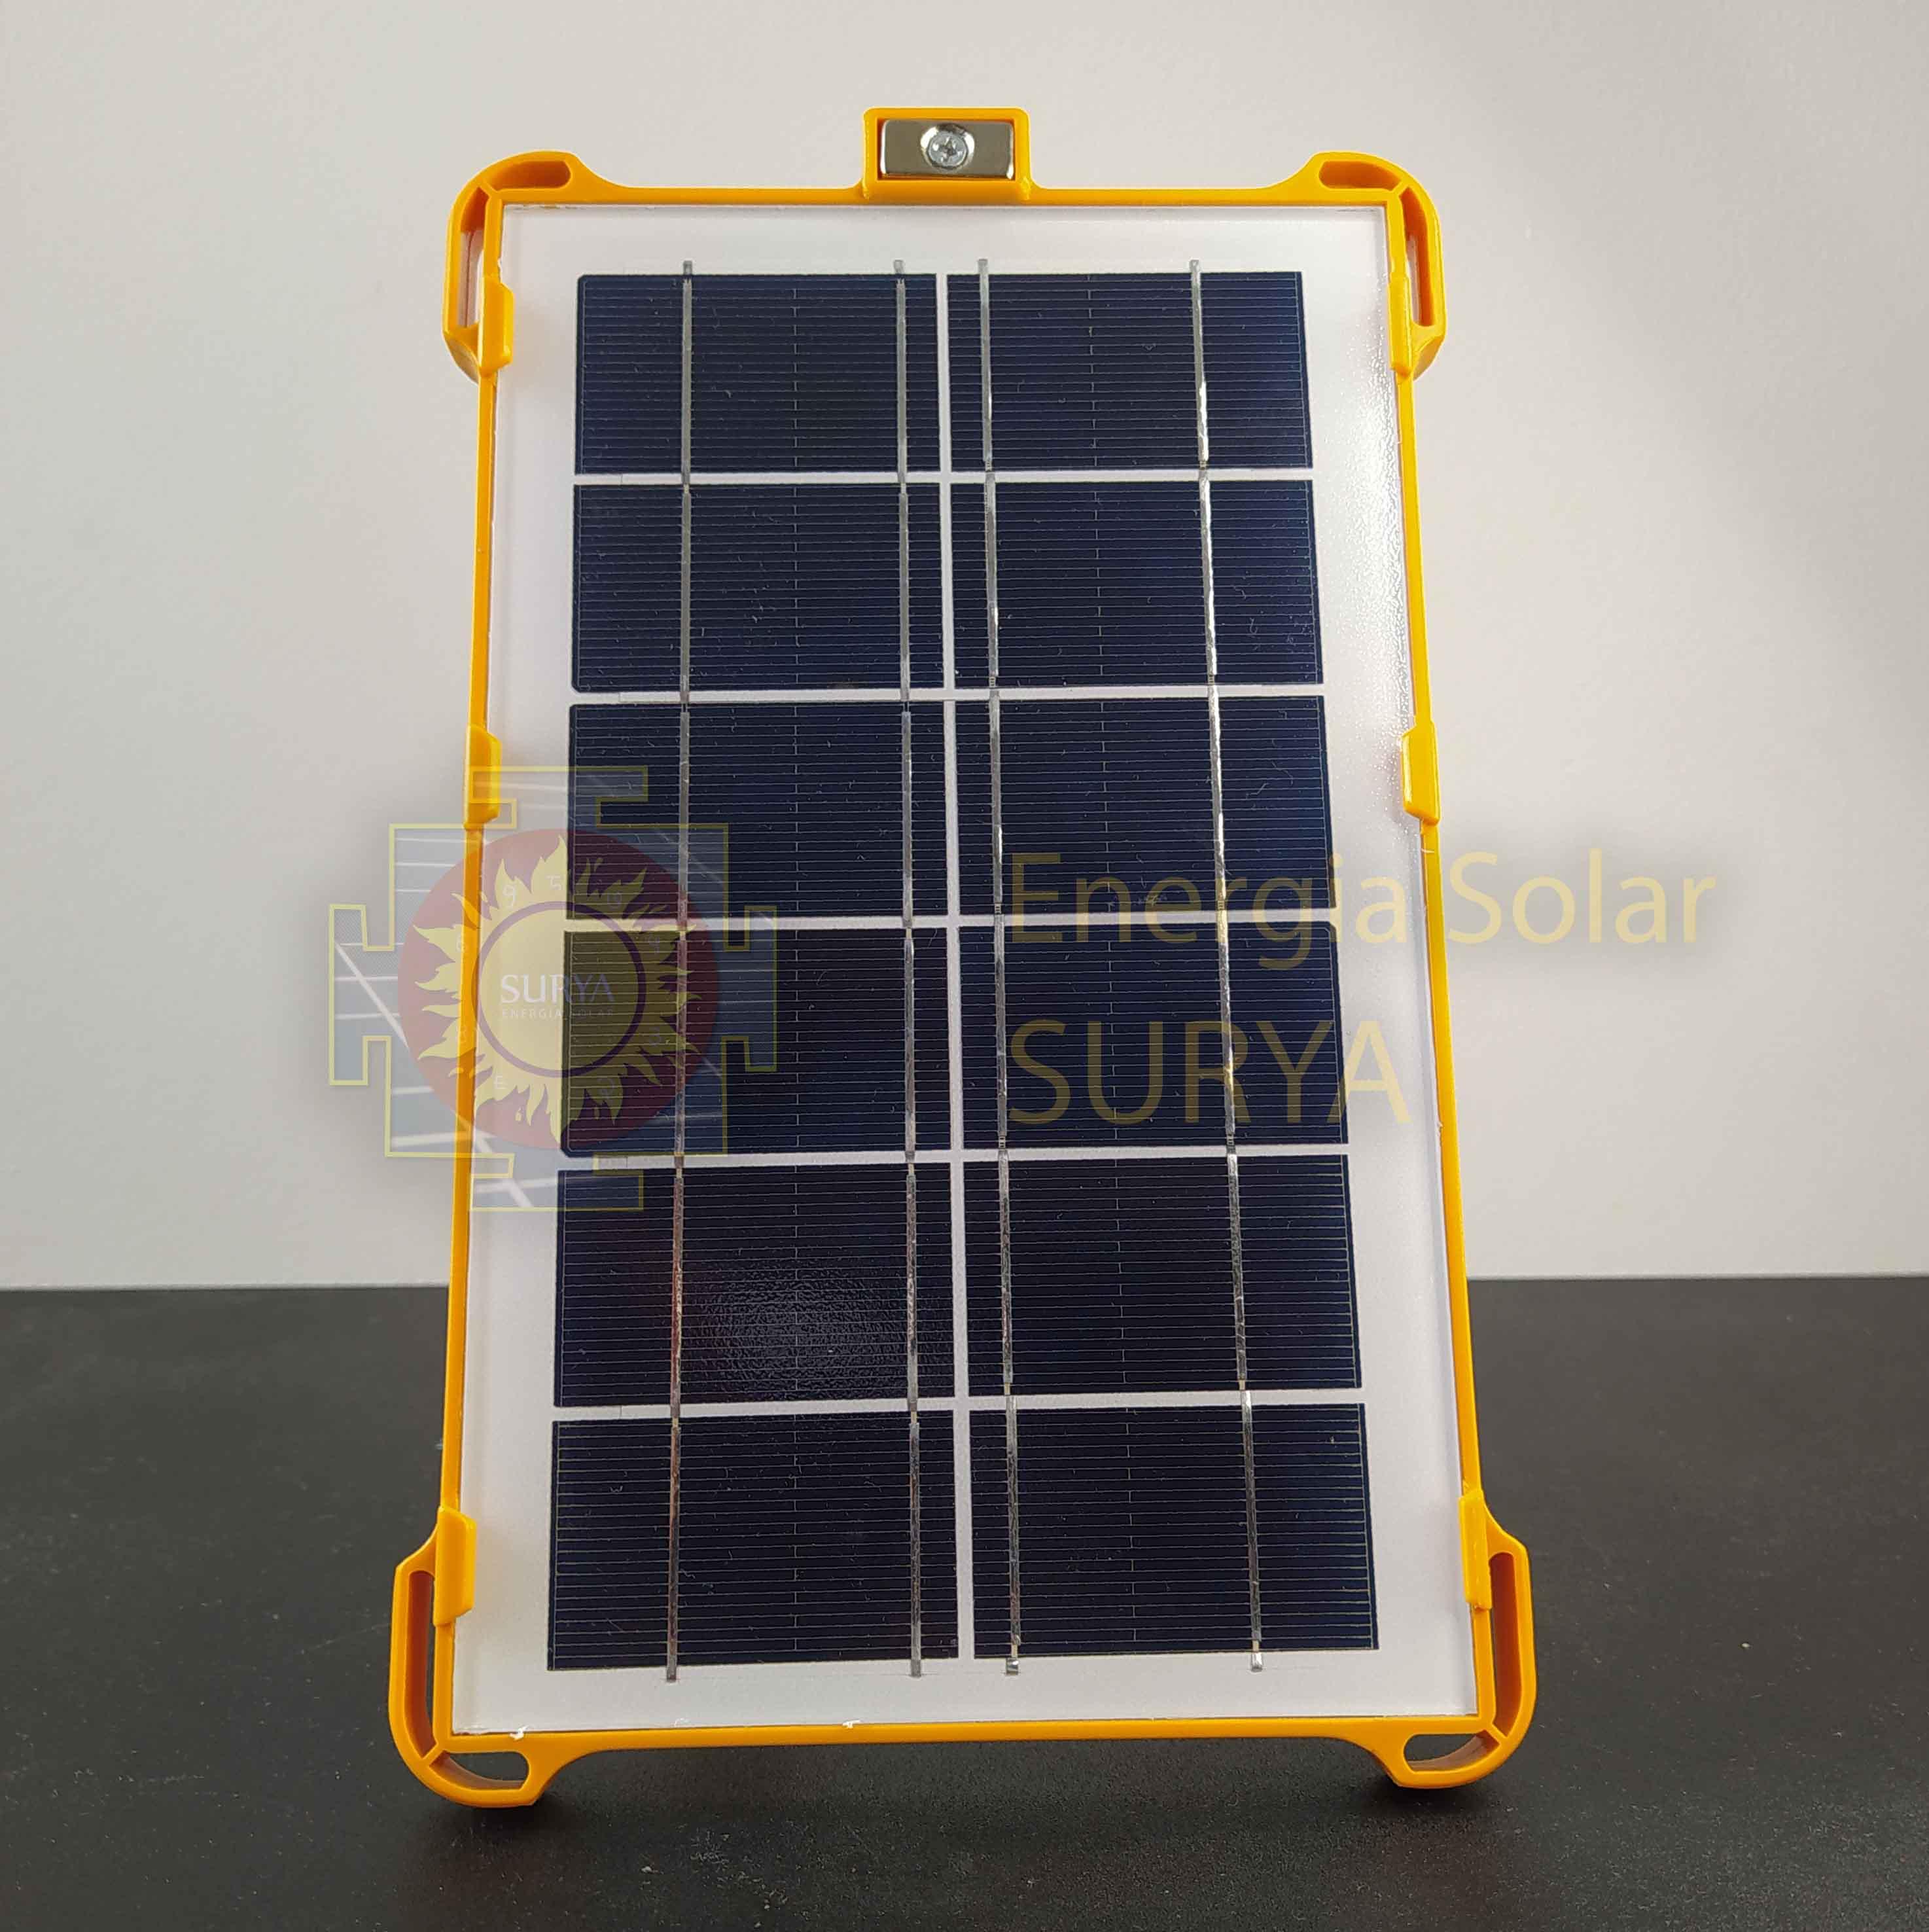 Energia solar para iluminacion pequeña y cargar celular 2